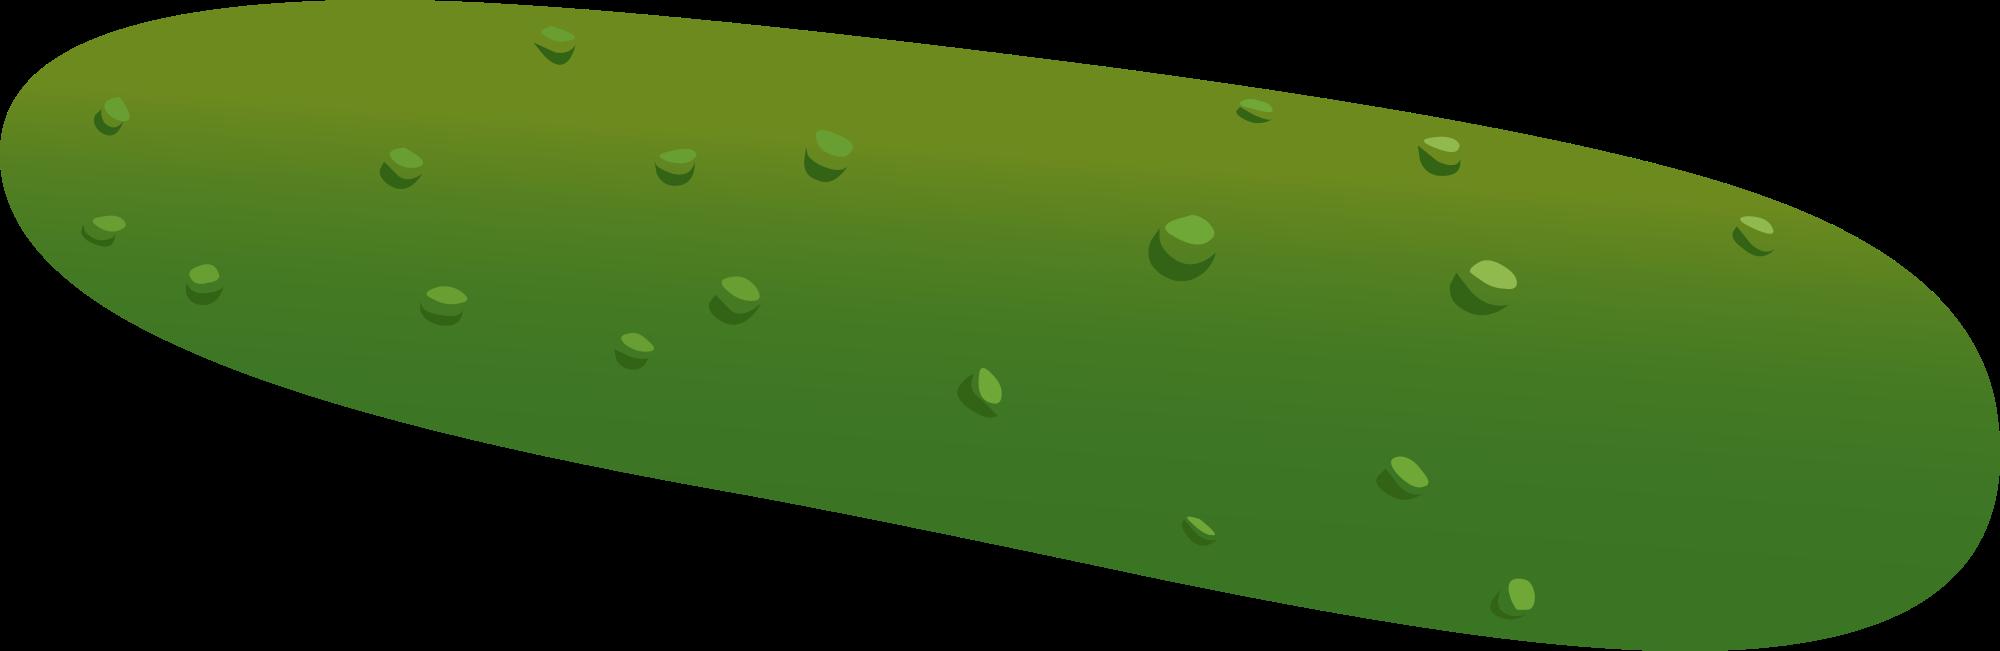 Zucchini clipart animated. Cucumber vegetable clip art